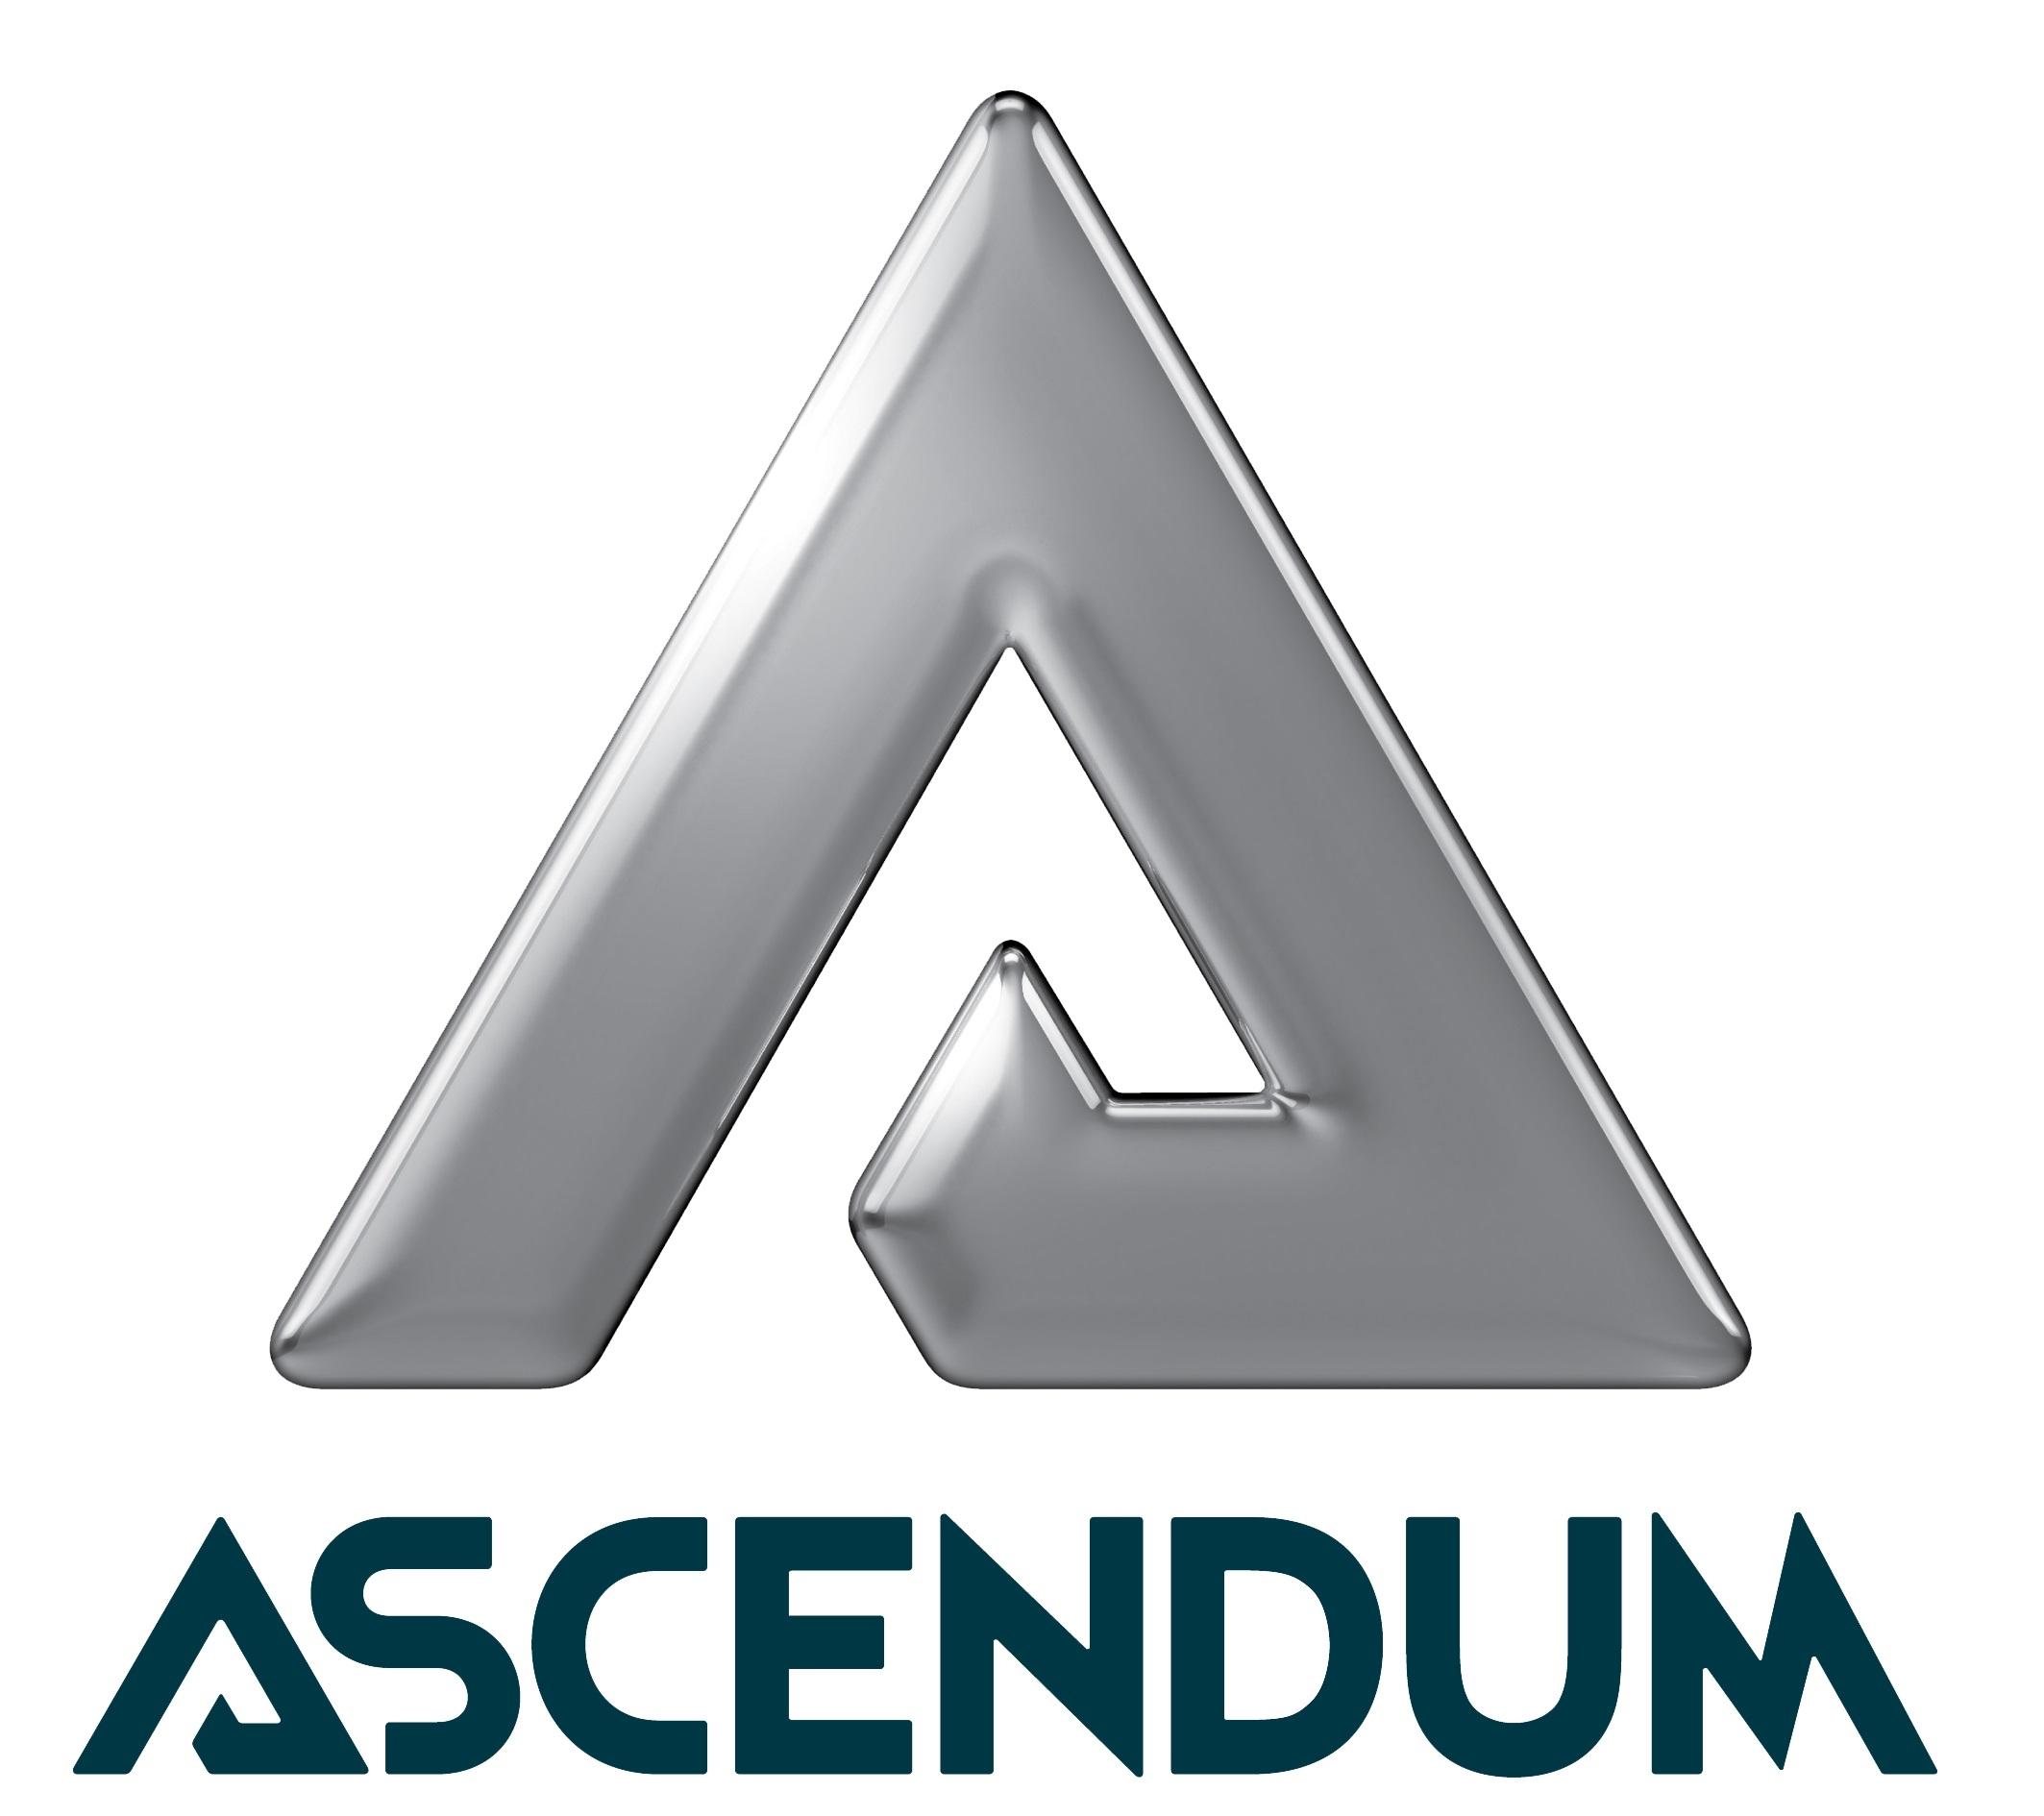 ASCENDUM company logo